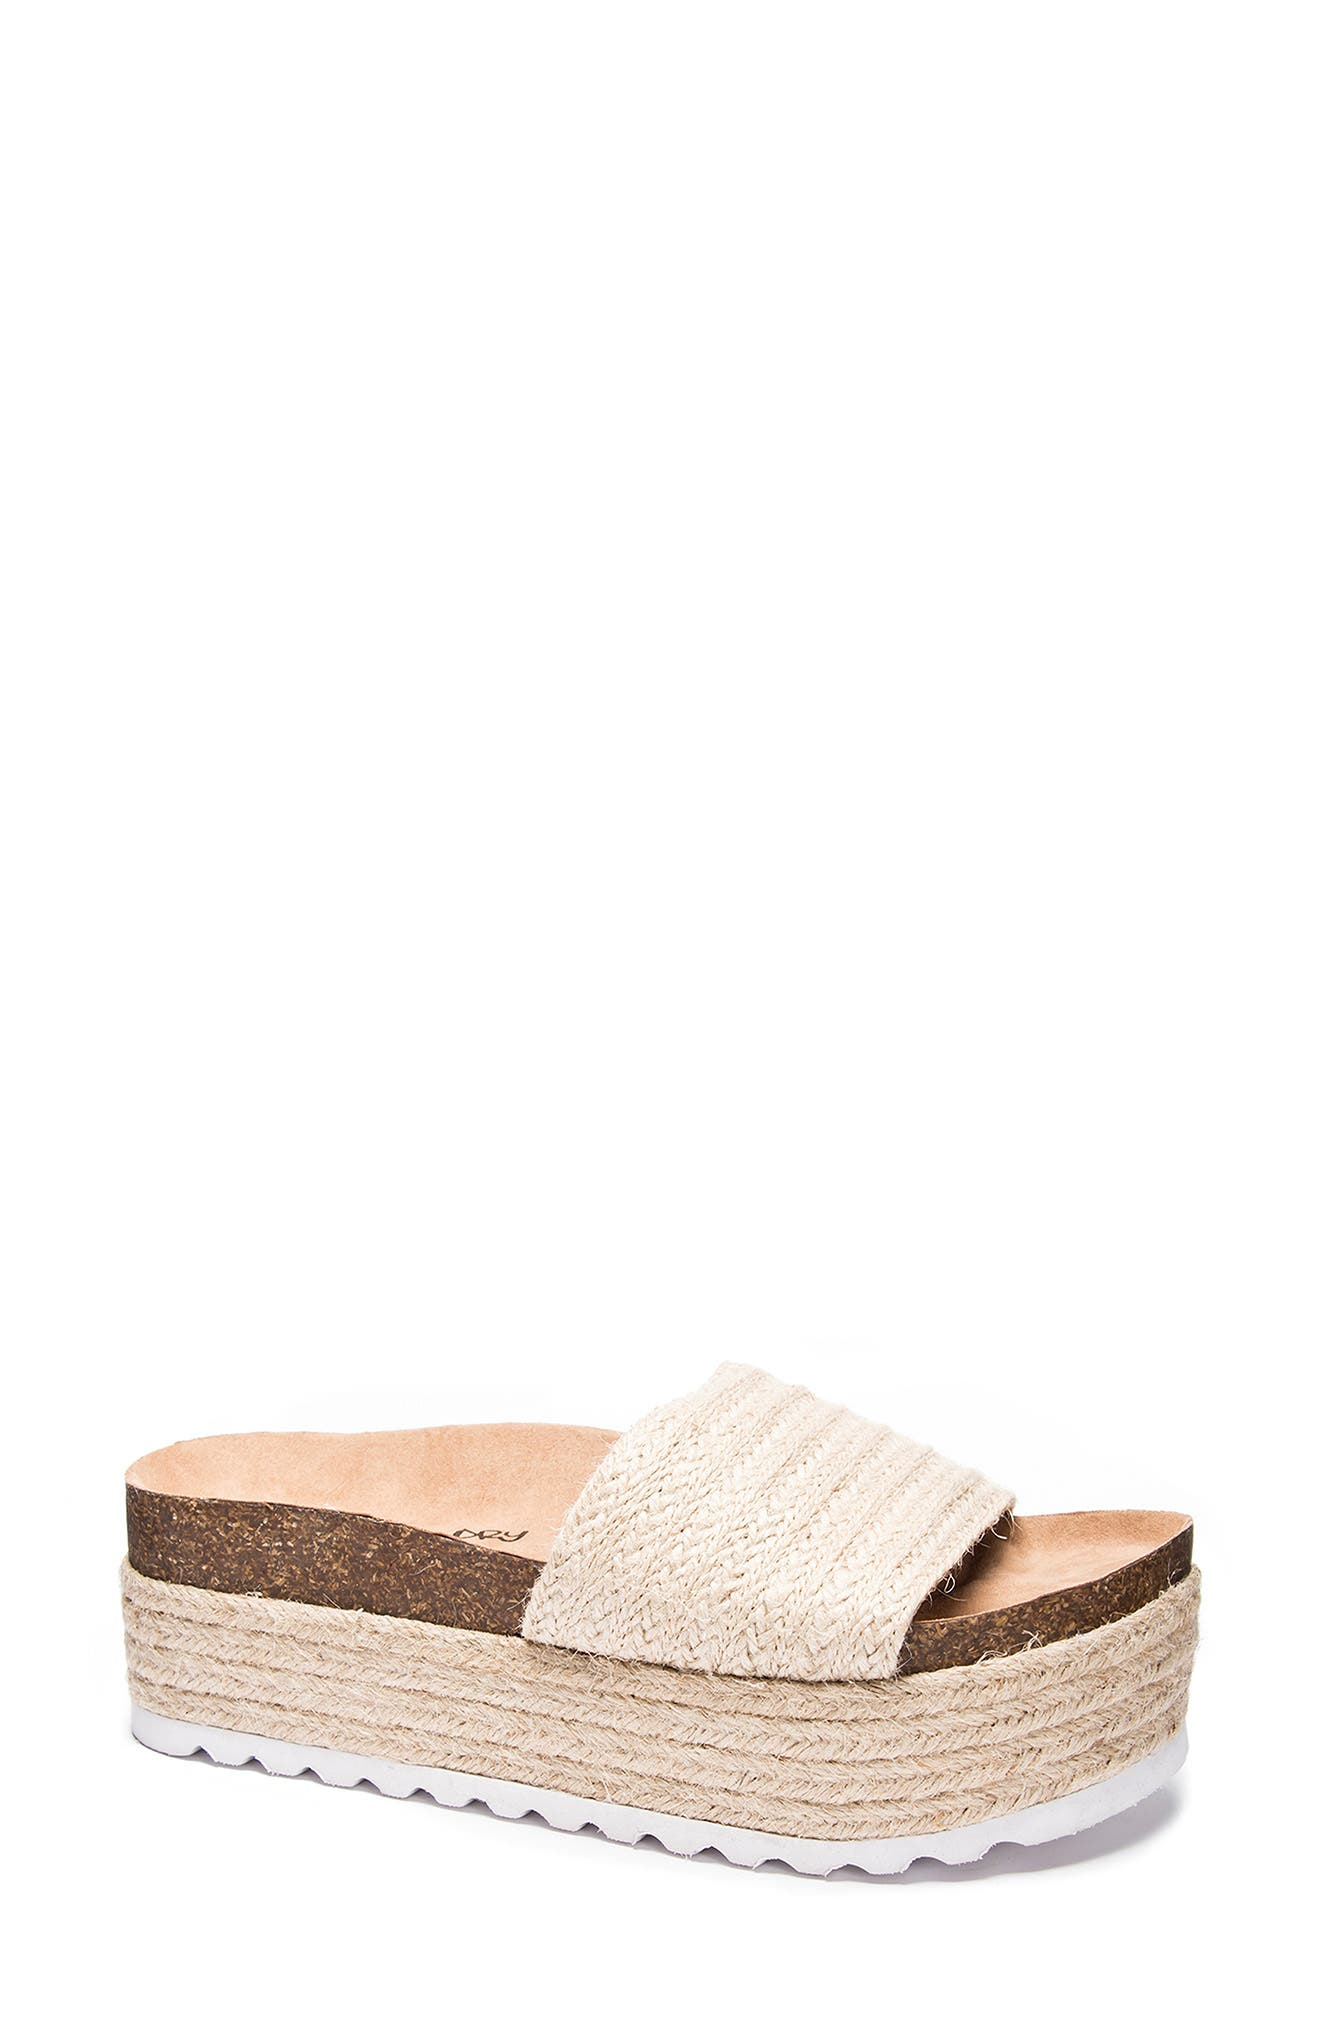 Palm Desert Platform Espadrille Slide Sandal